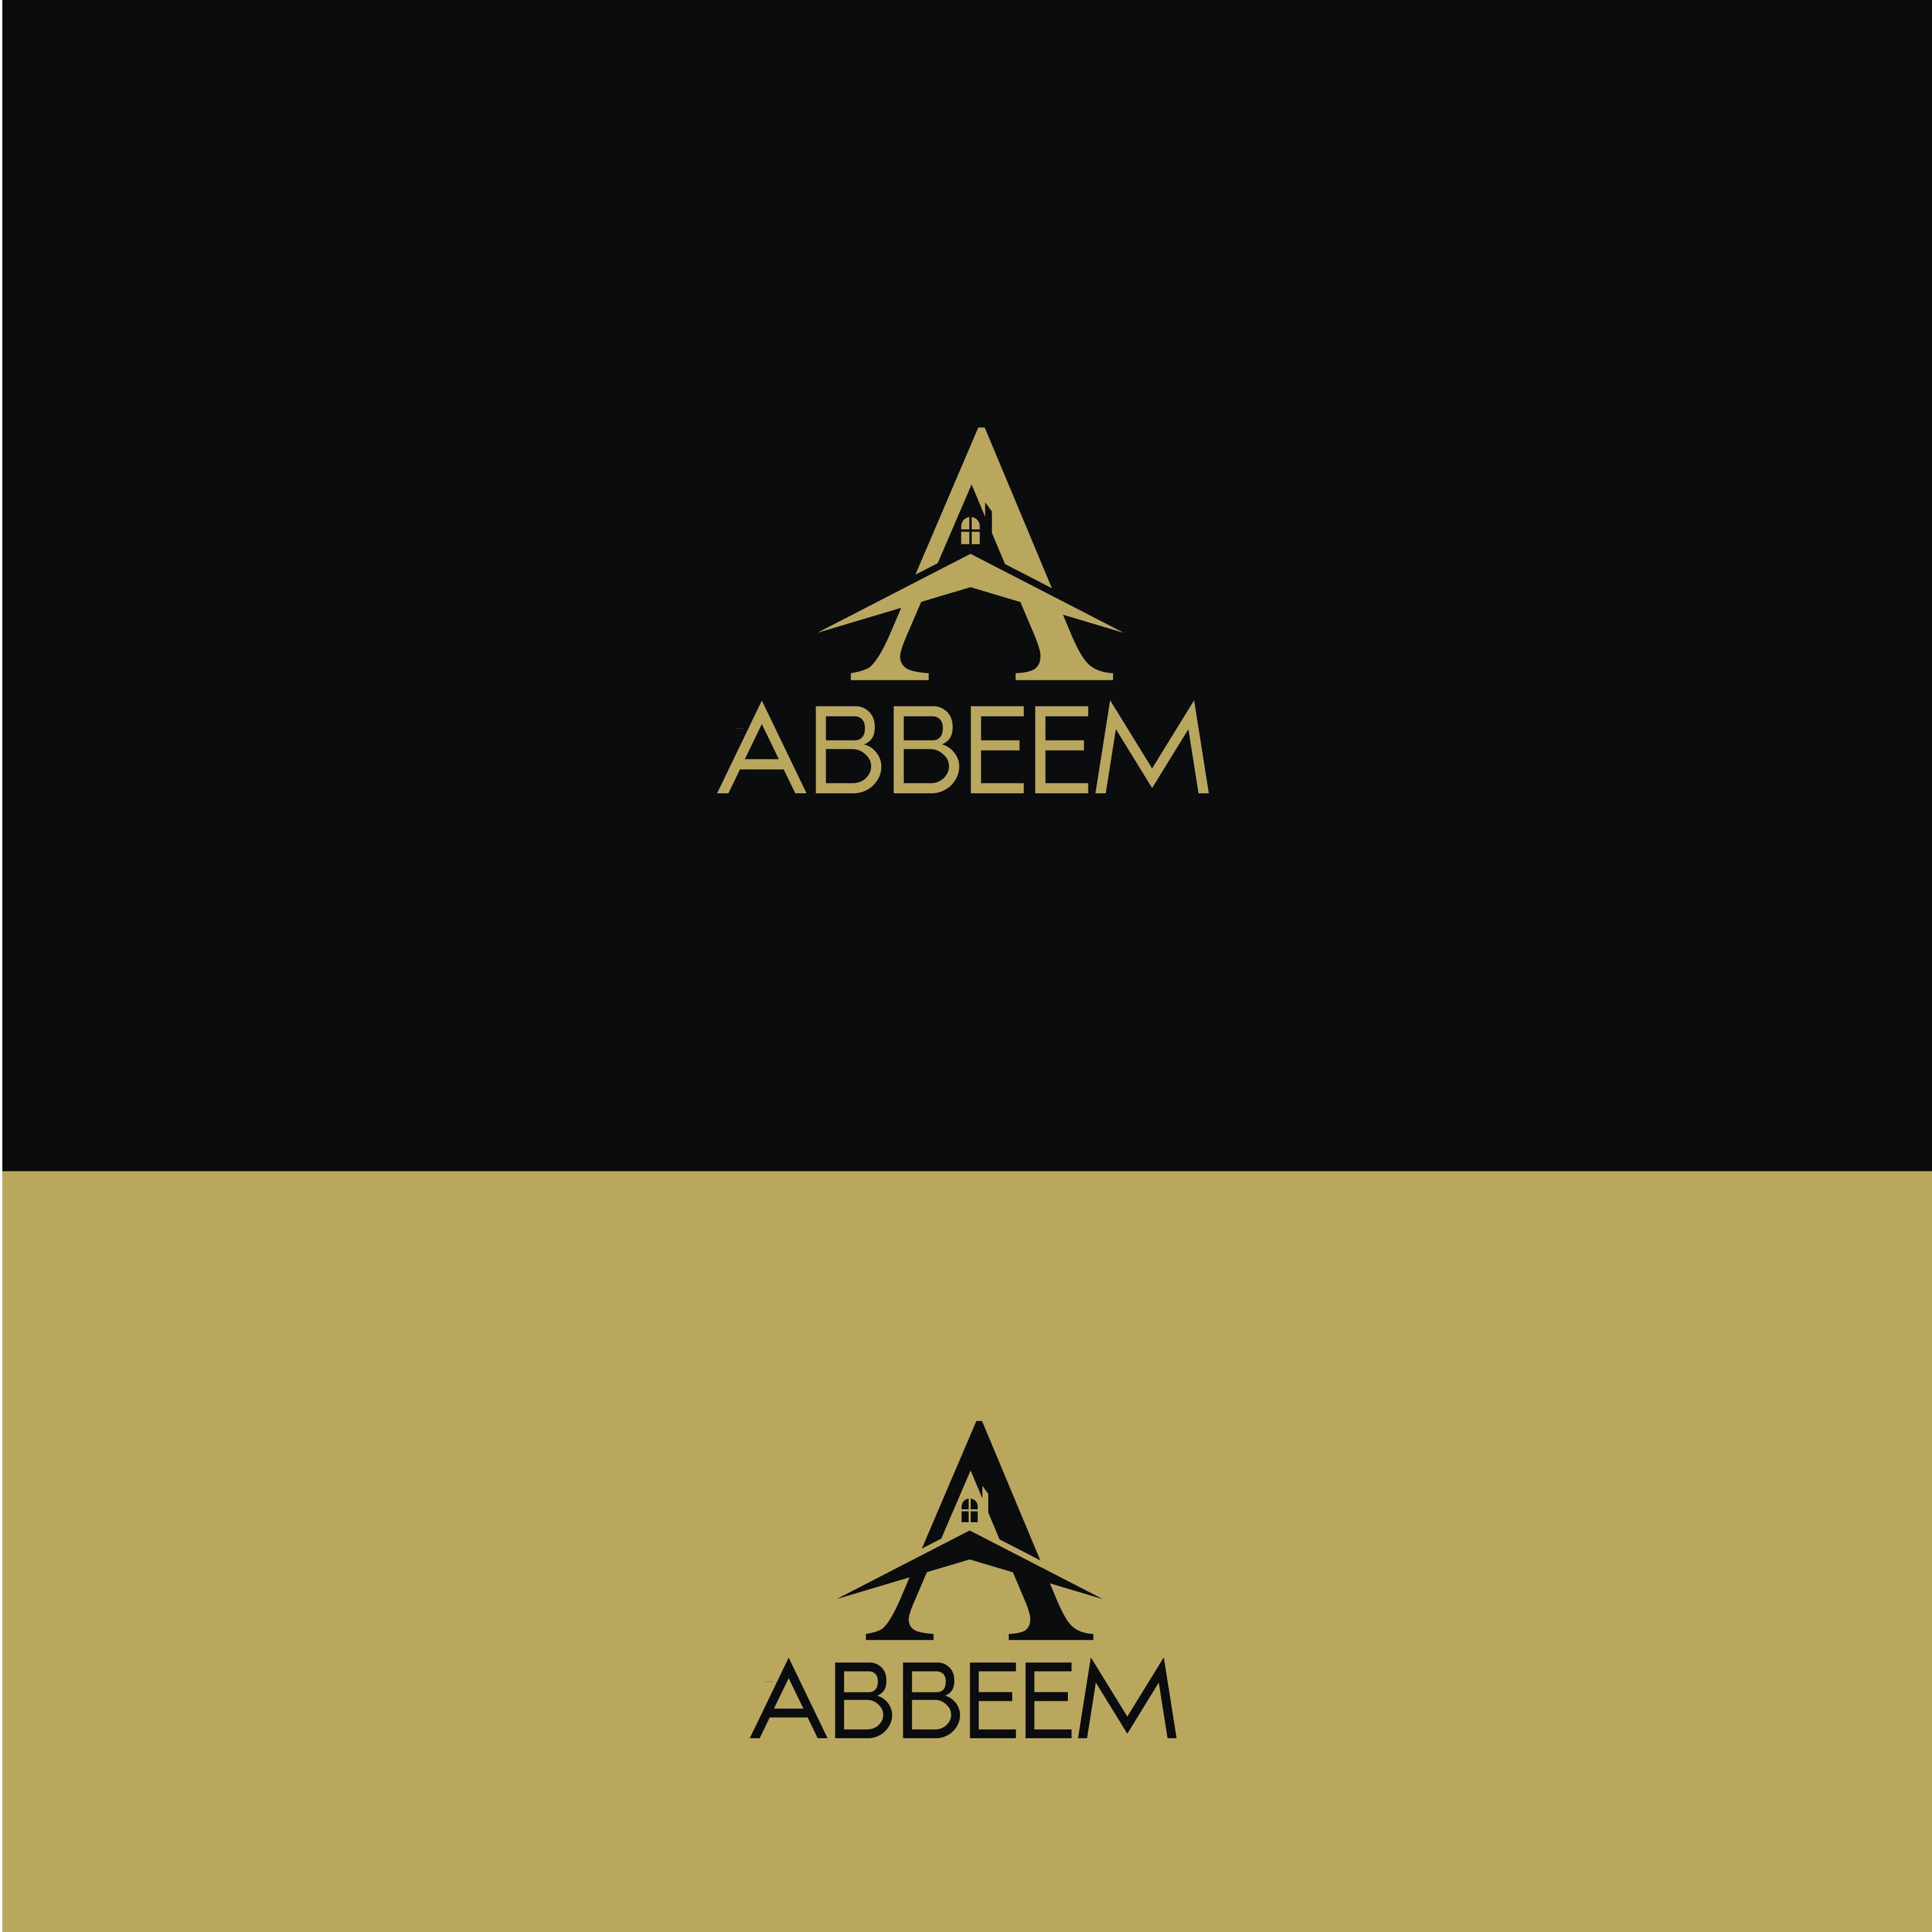 Logo Design by Private User - Entry No. 186 in the Logo Design Contest Luxury Logo Design for Abbeem.